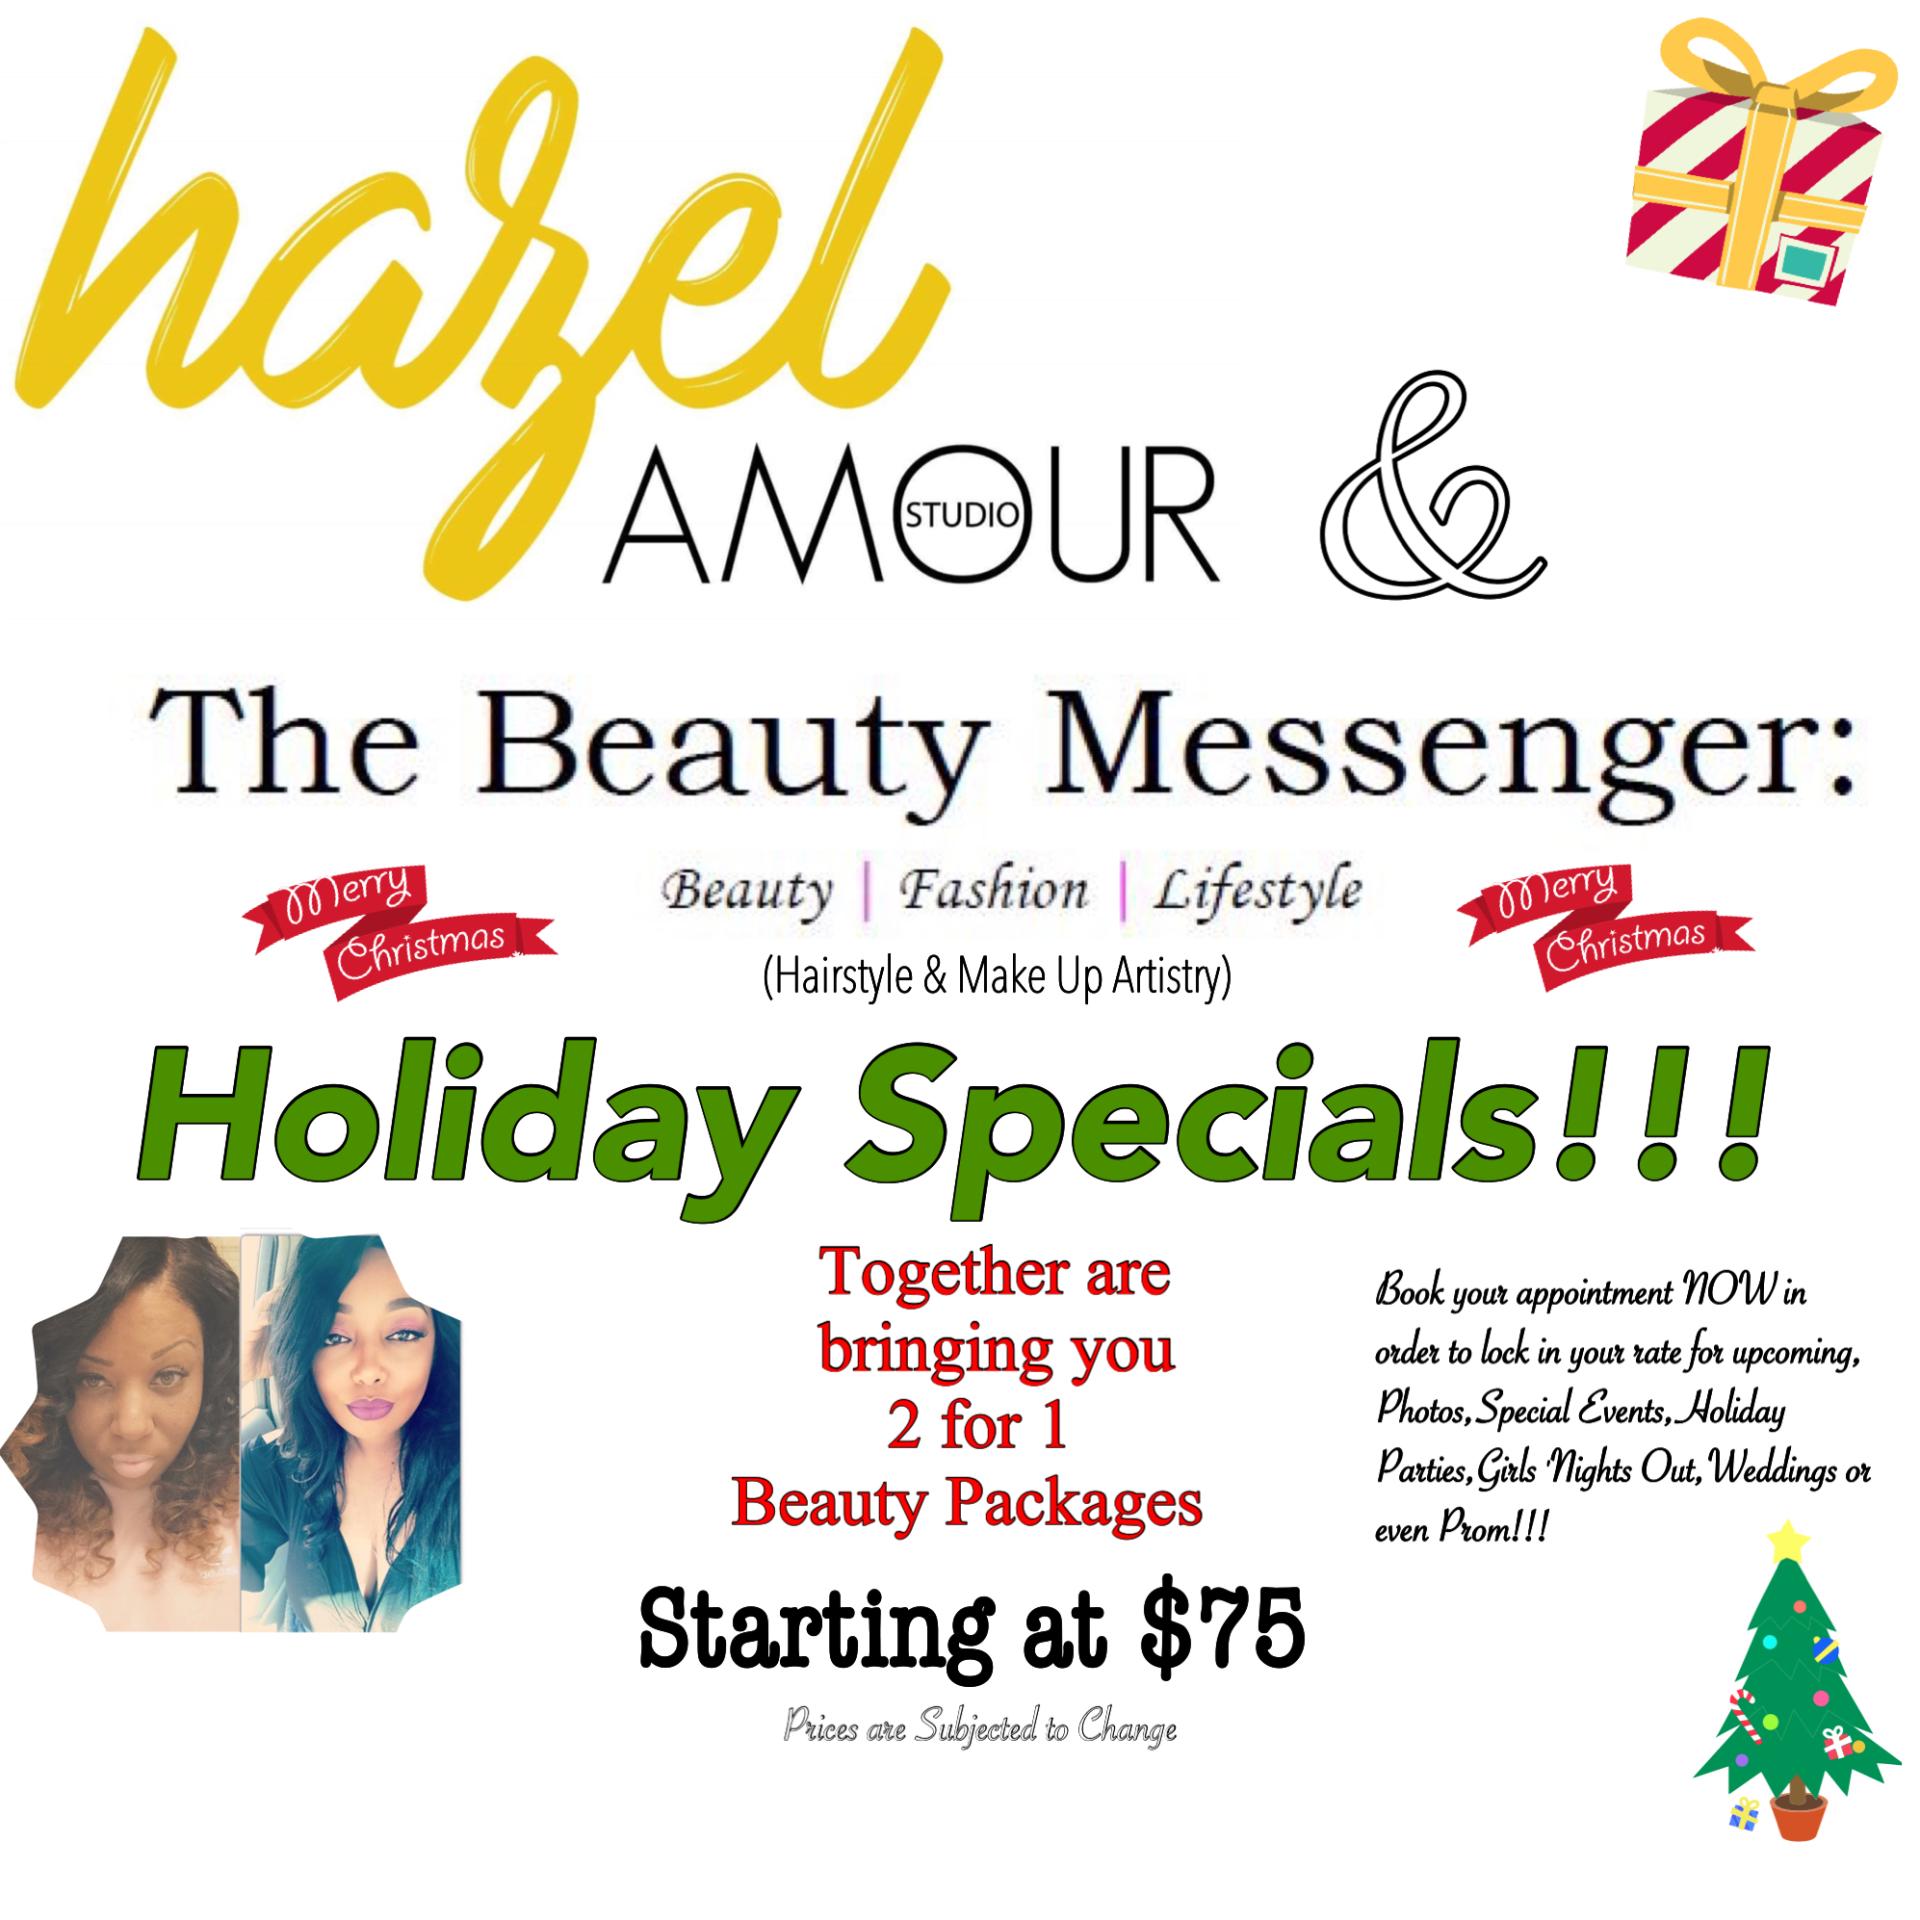 Hazel Amour & The Beauty Messenger Collaboration